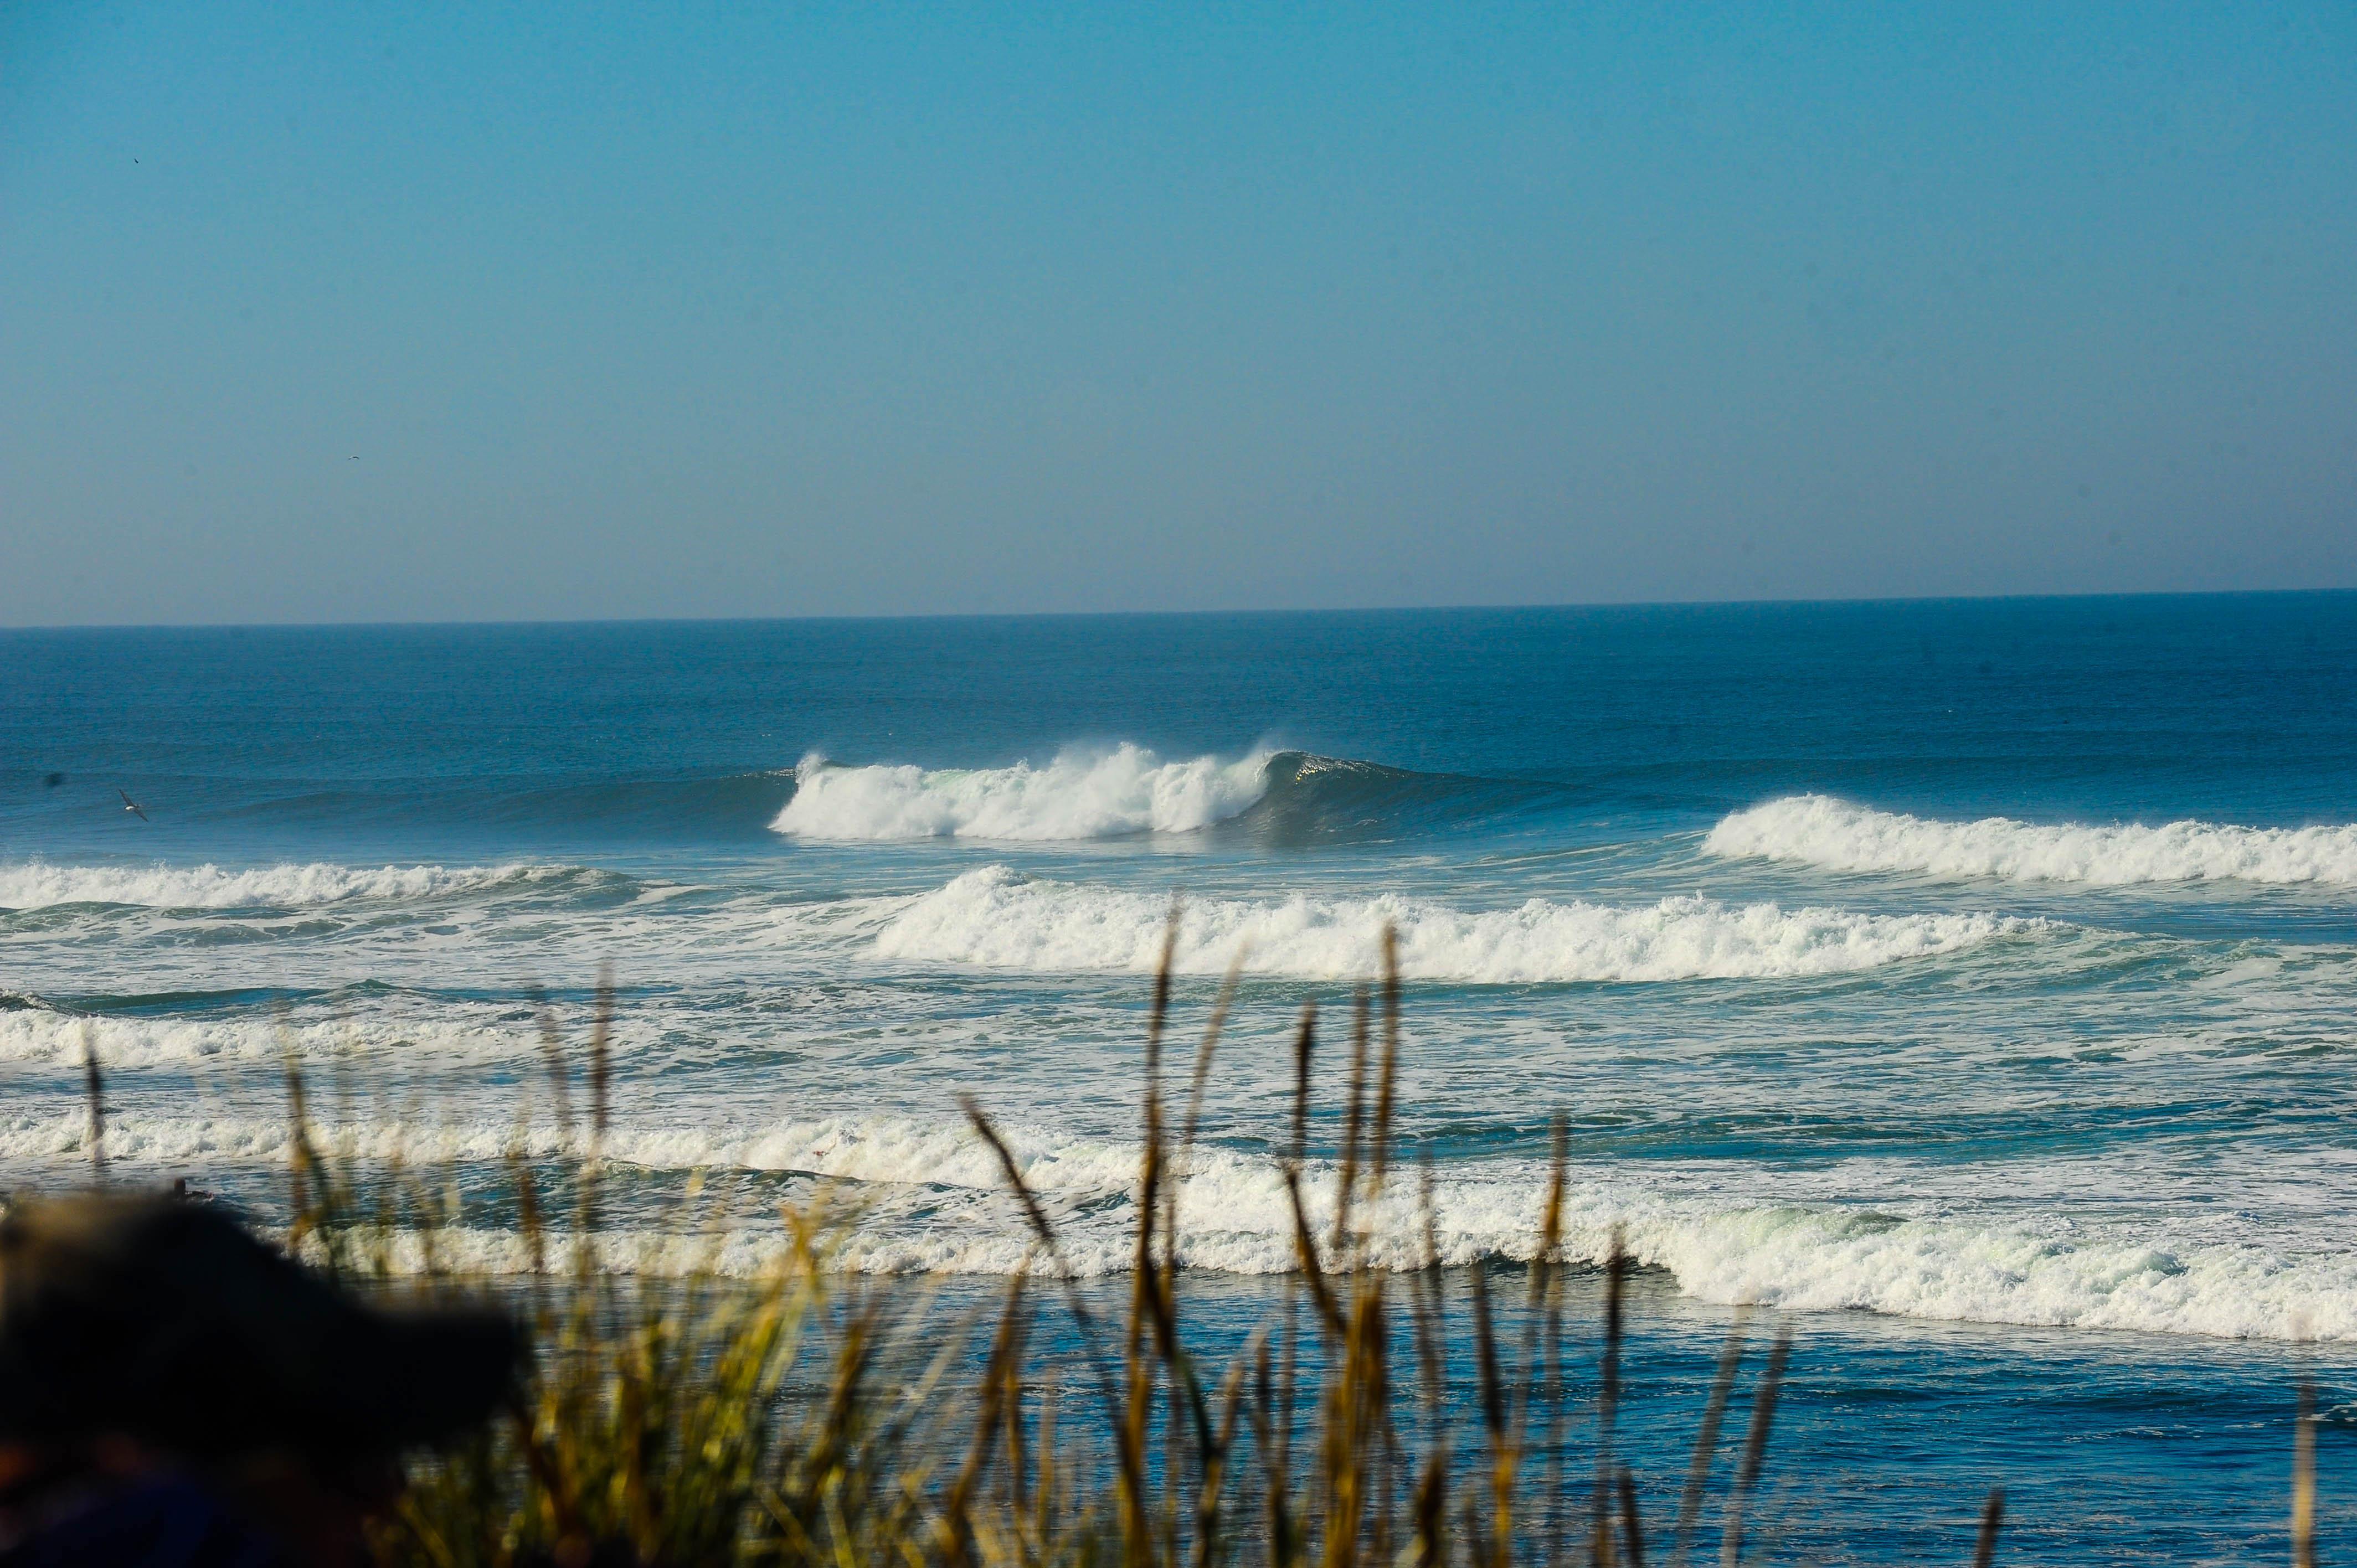 westport surf report forecast map of westport surf spots cams